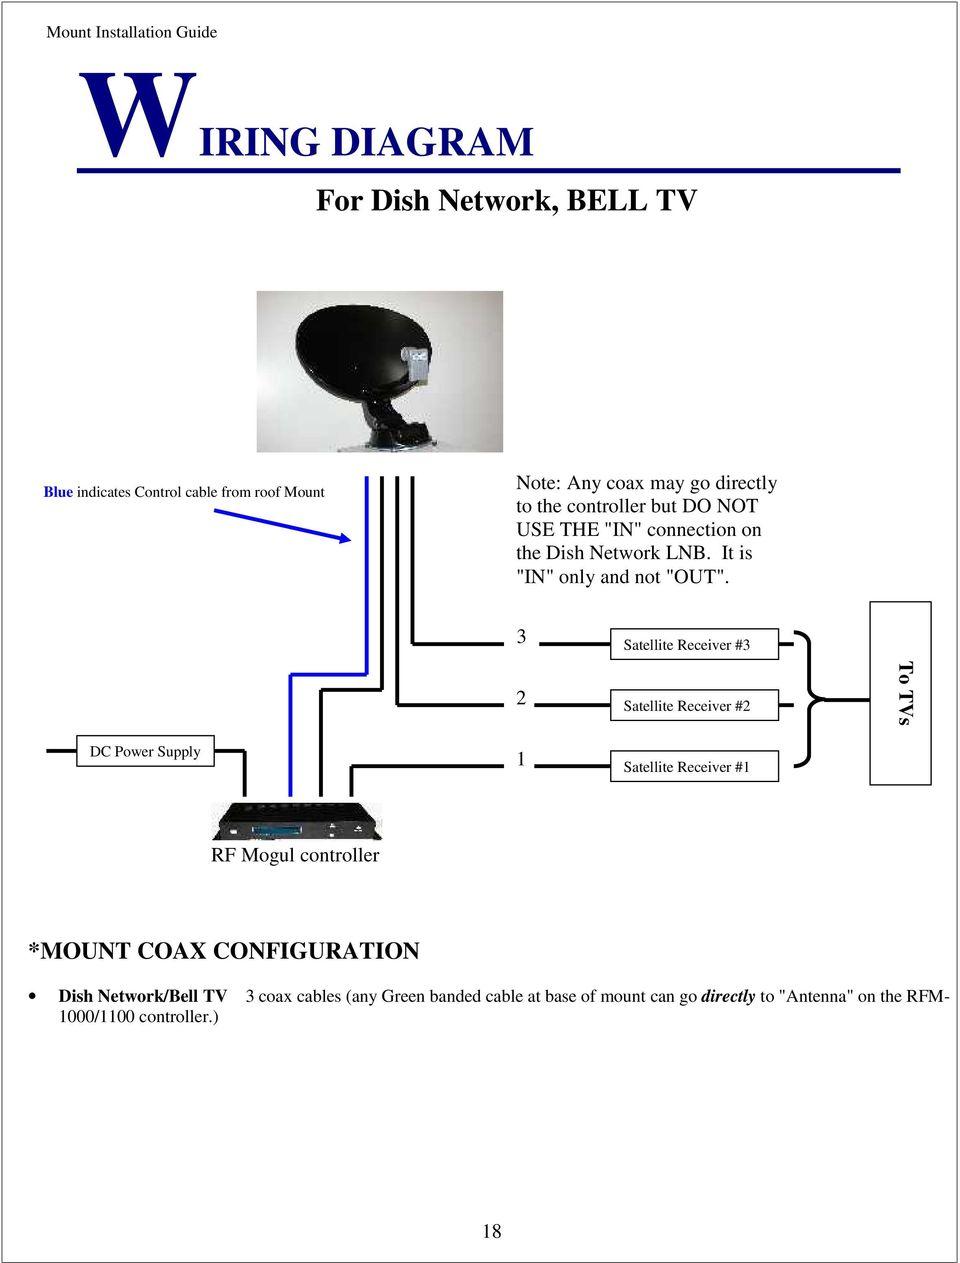 medium resolution of 3 2 satellite receiver 3 satellite receiver 2 to tvs dc power supply 1 19 wiring diagram